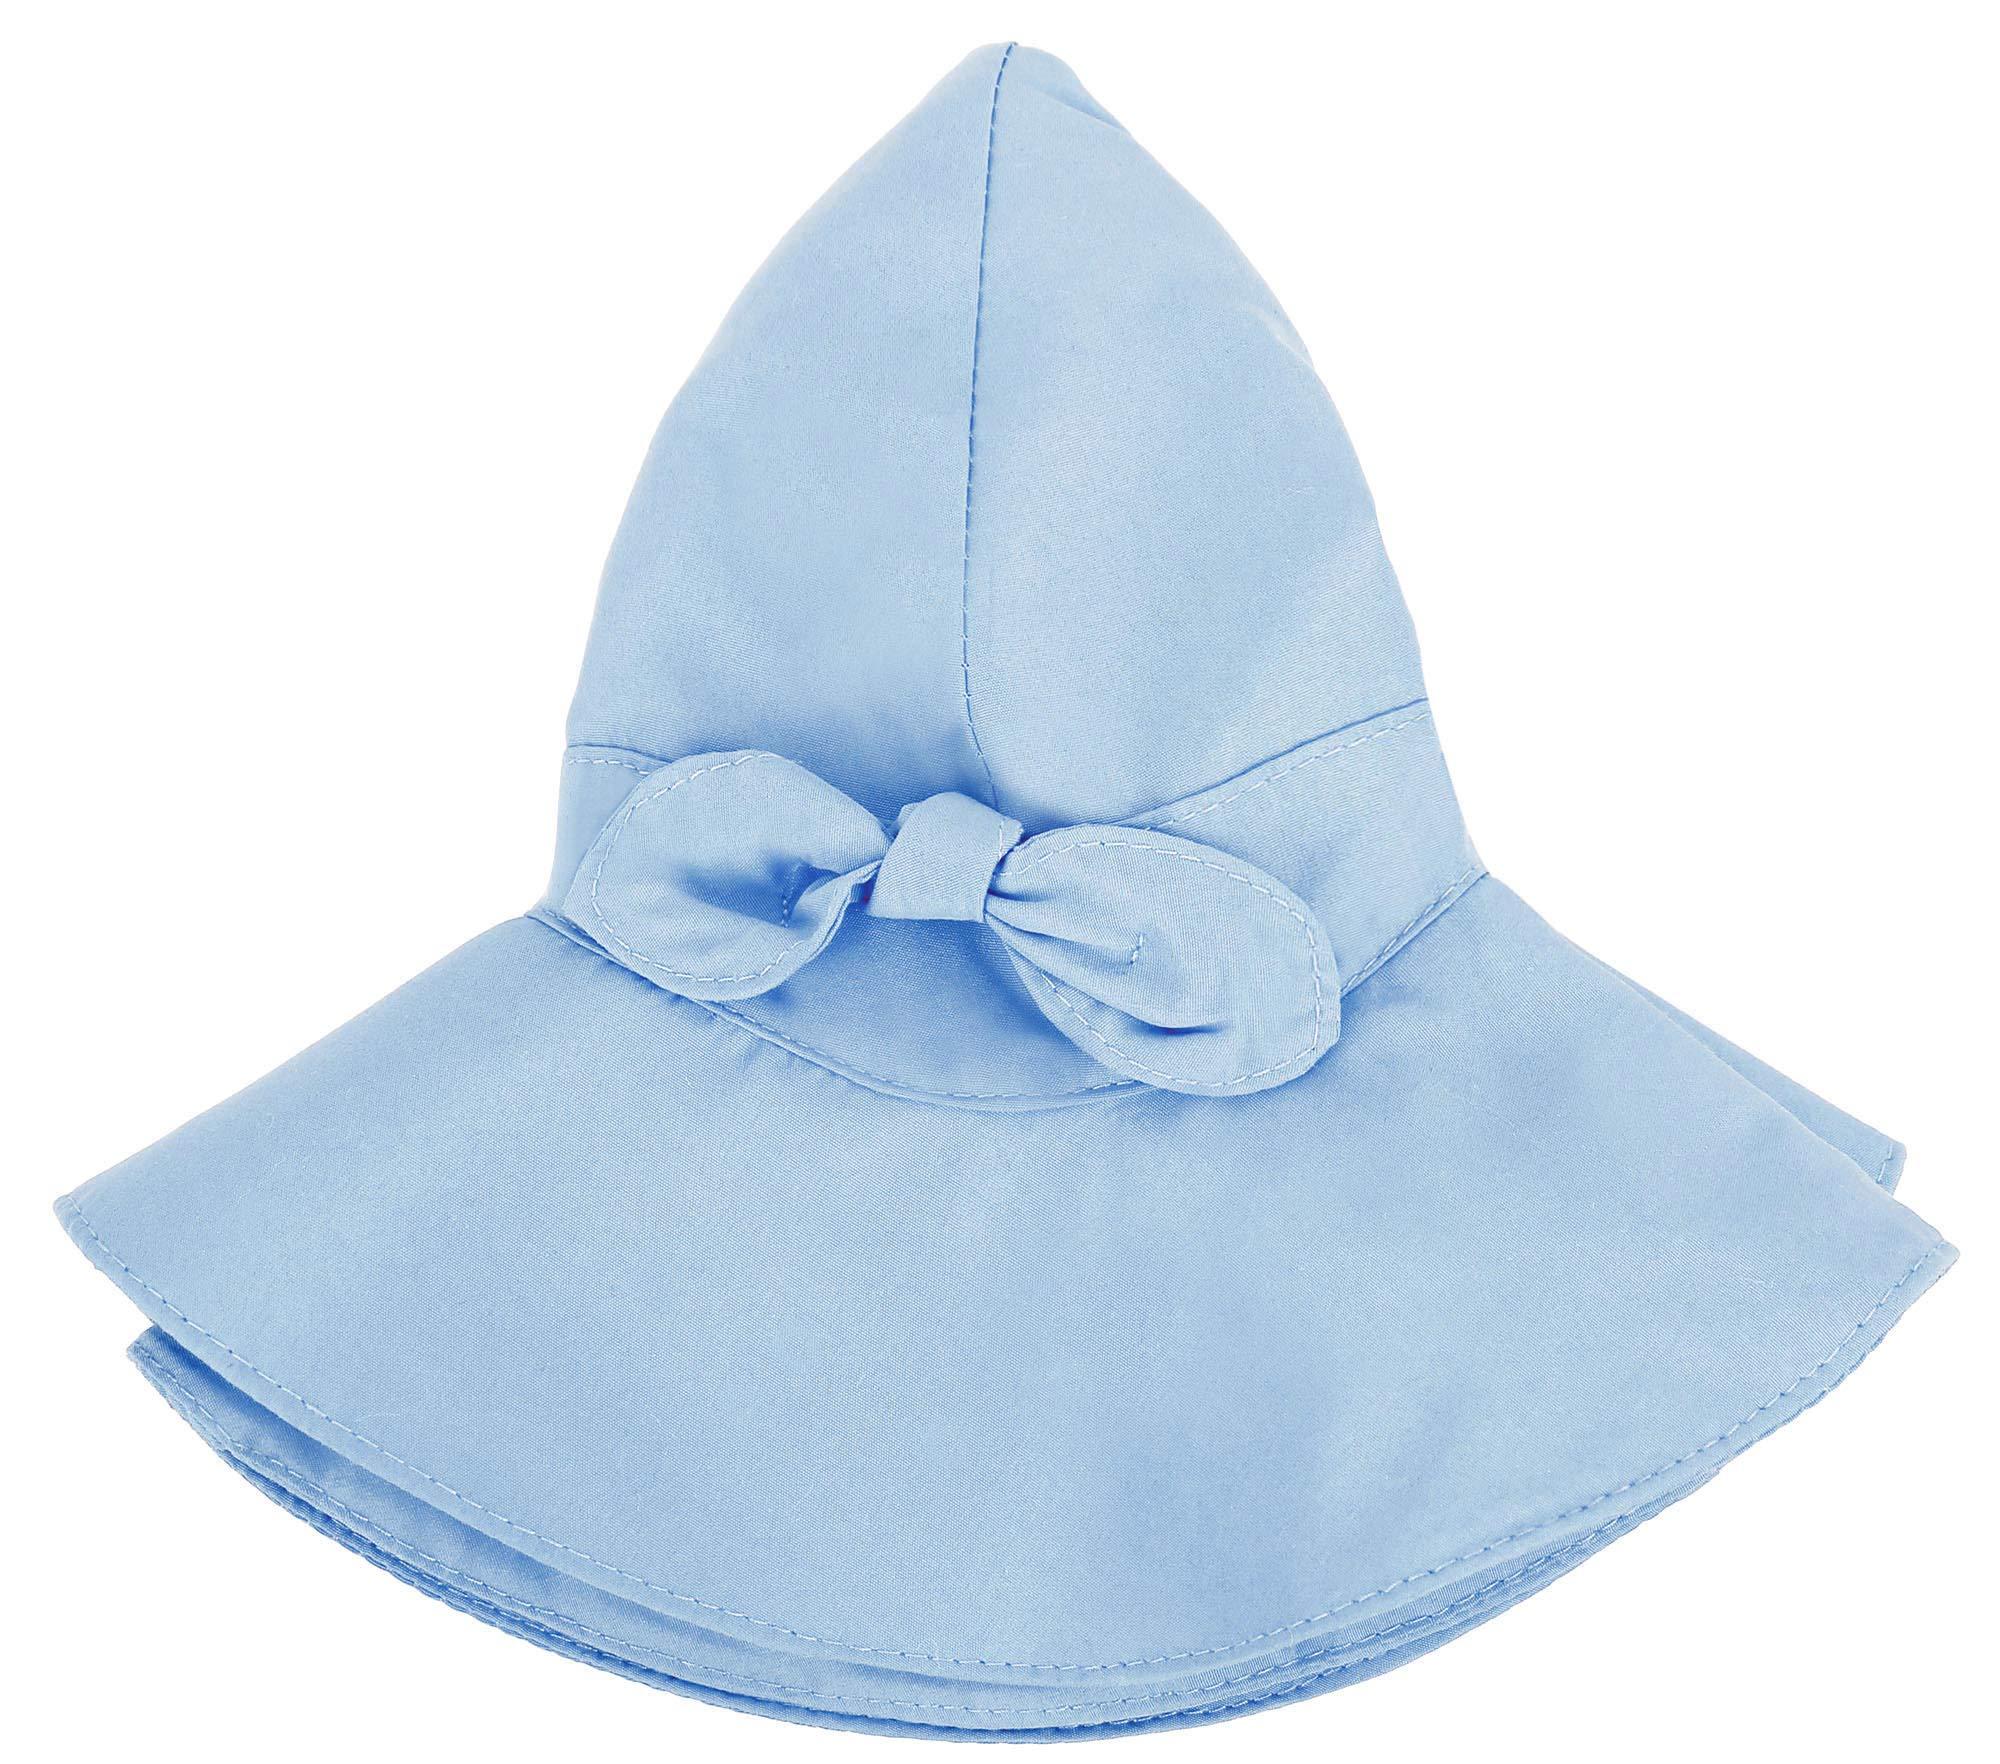 Siero Baby Wide Brim Sun Protection Hat UPF50+ Adjustable Cap, Blue 12-24 Months